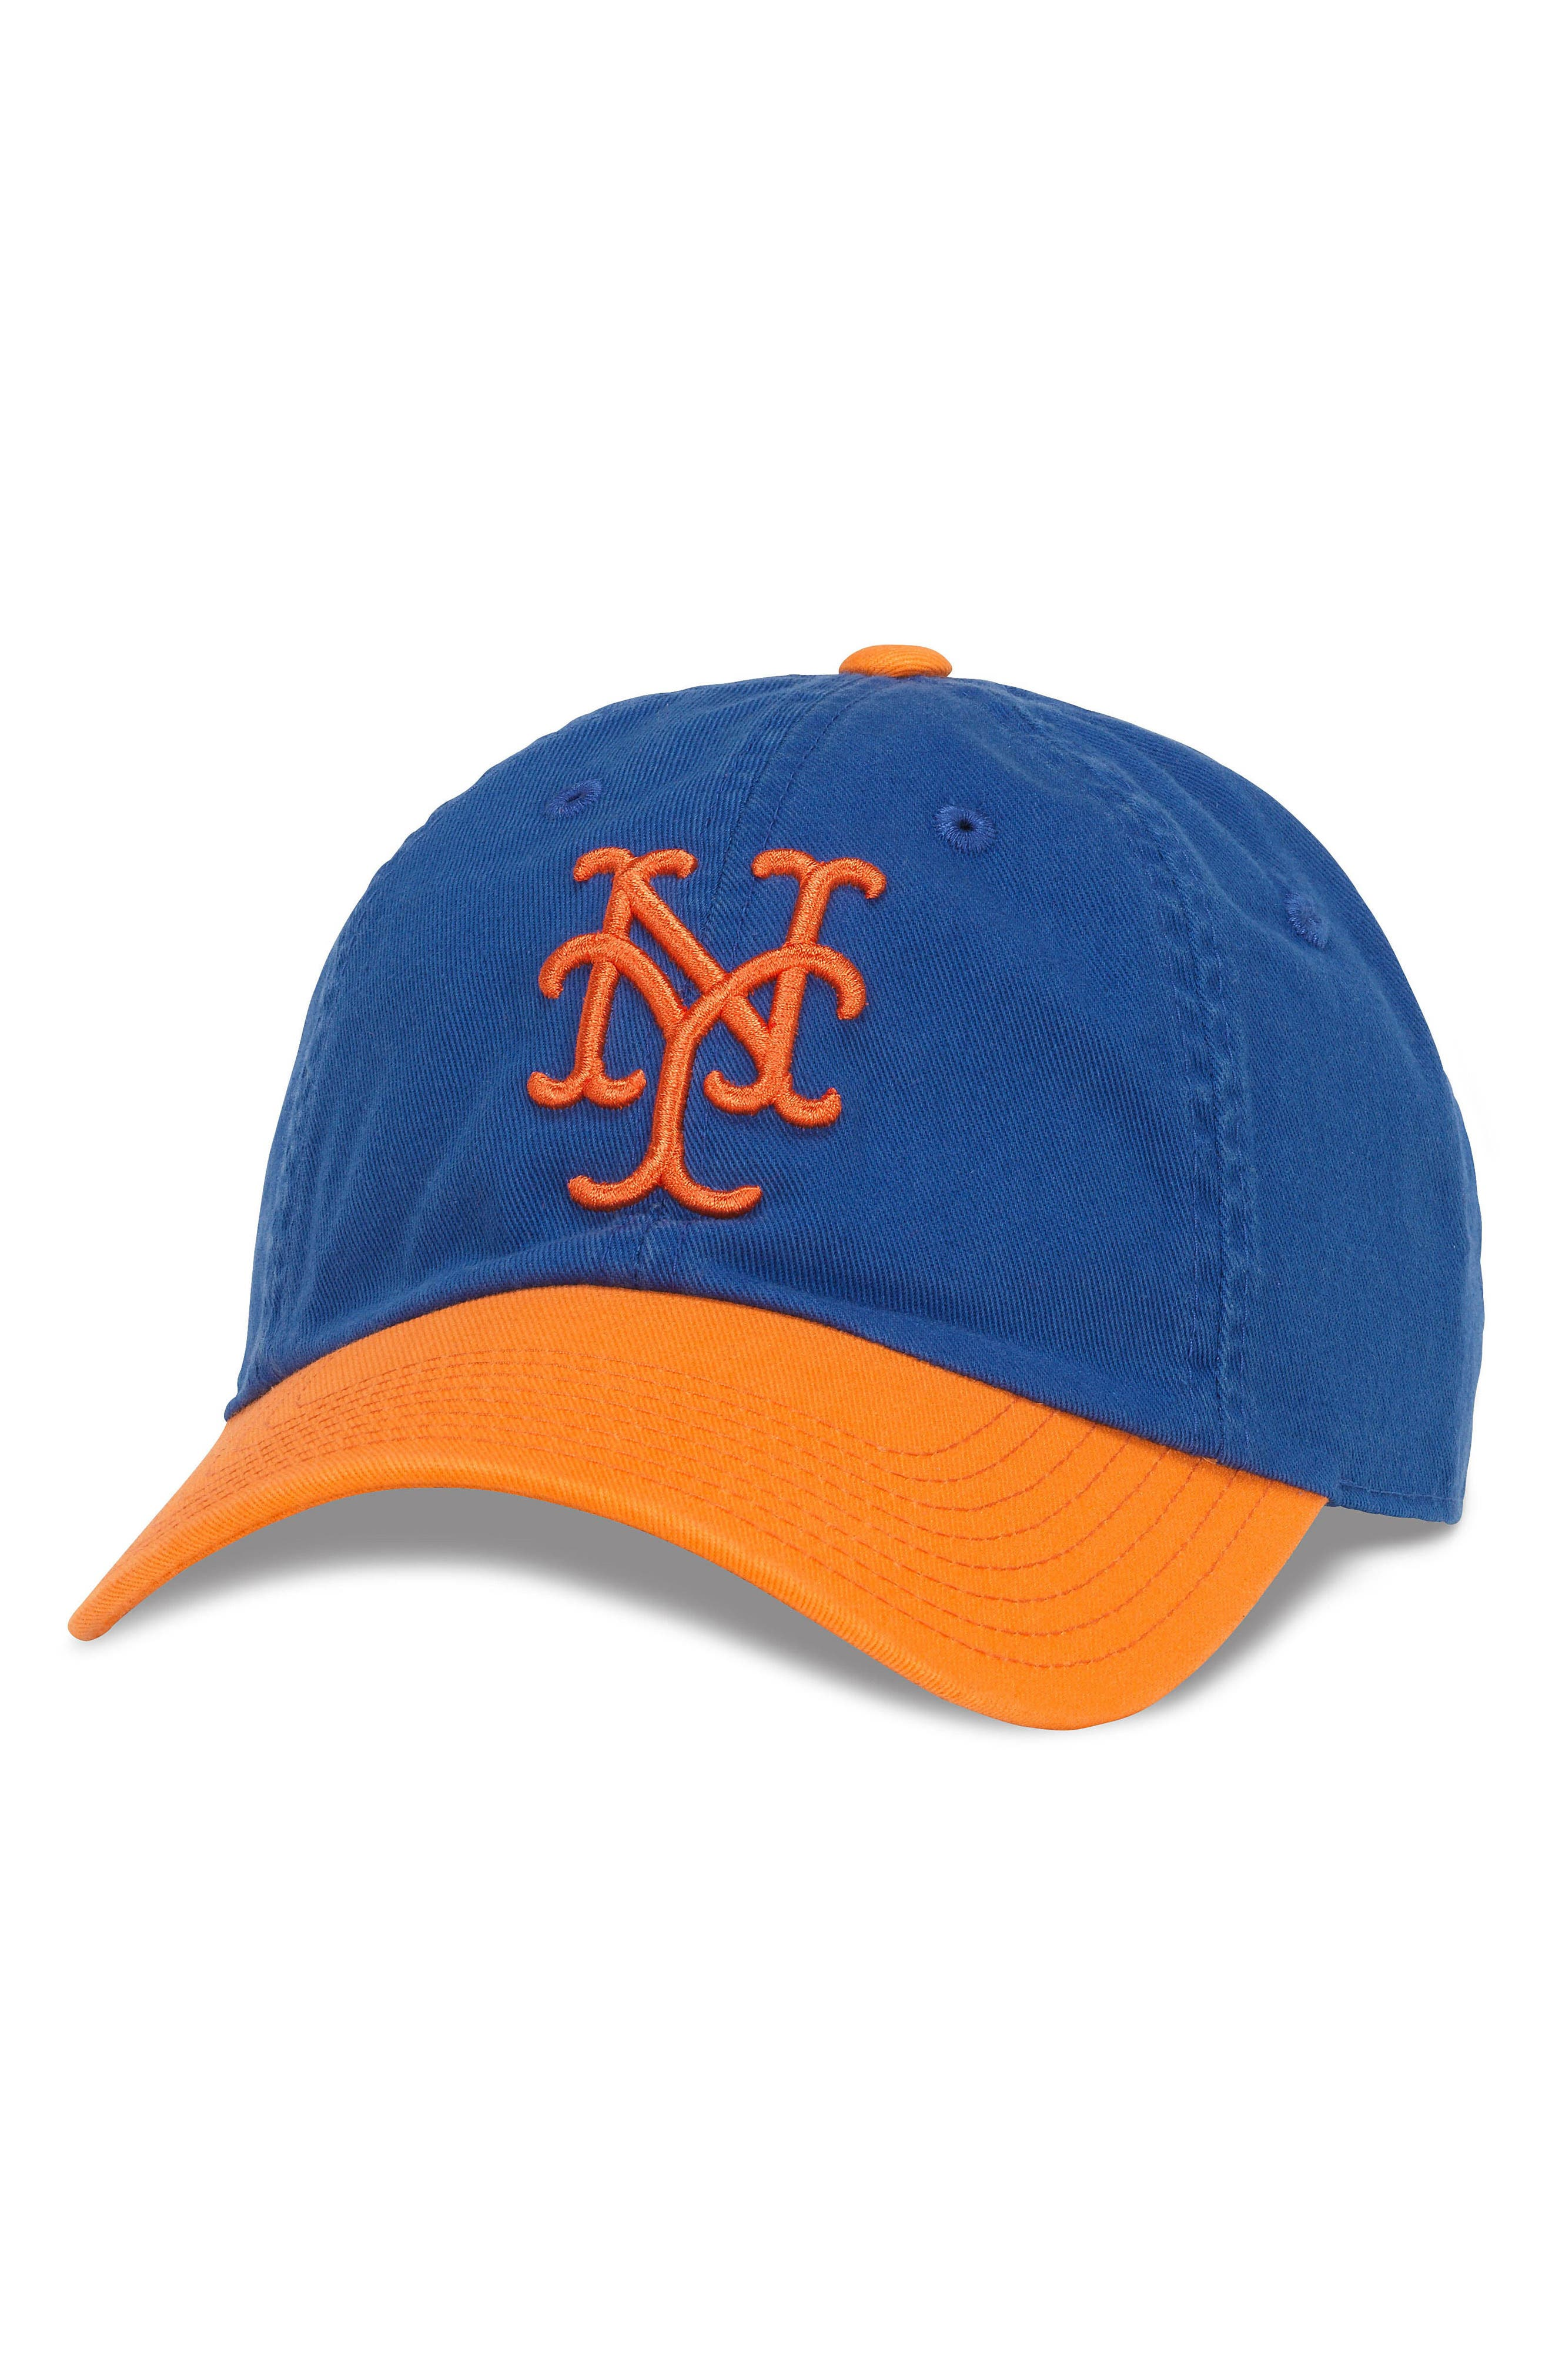 Main Image - American Needle Ballpark MLB Baseball Cap